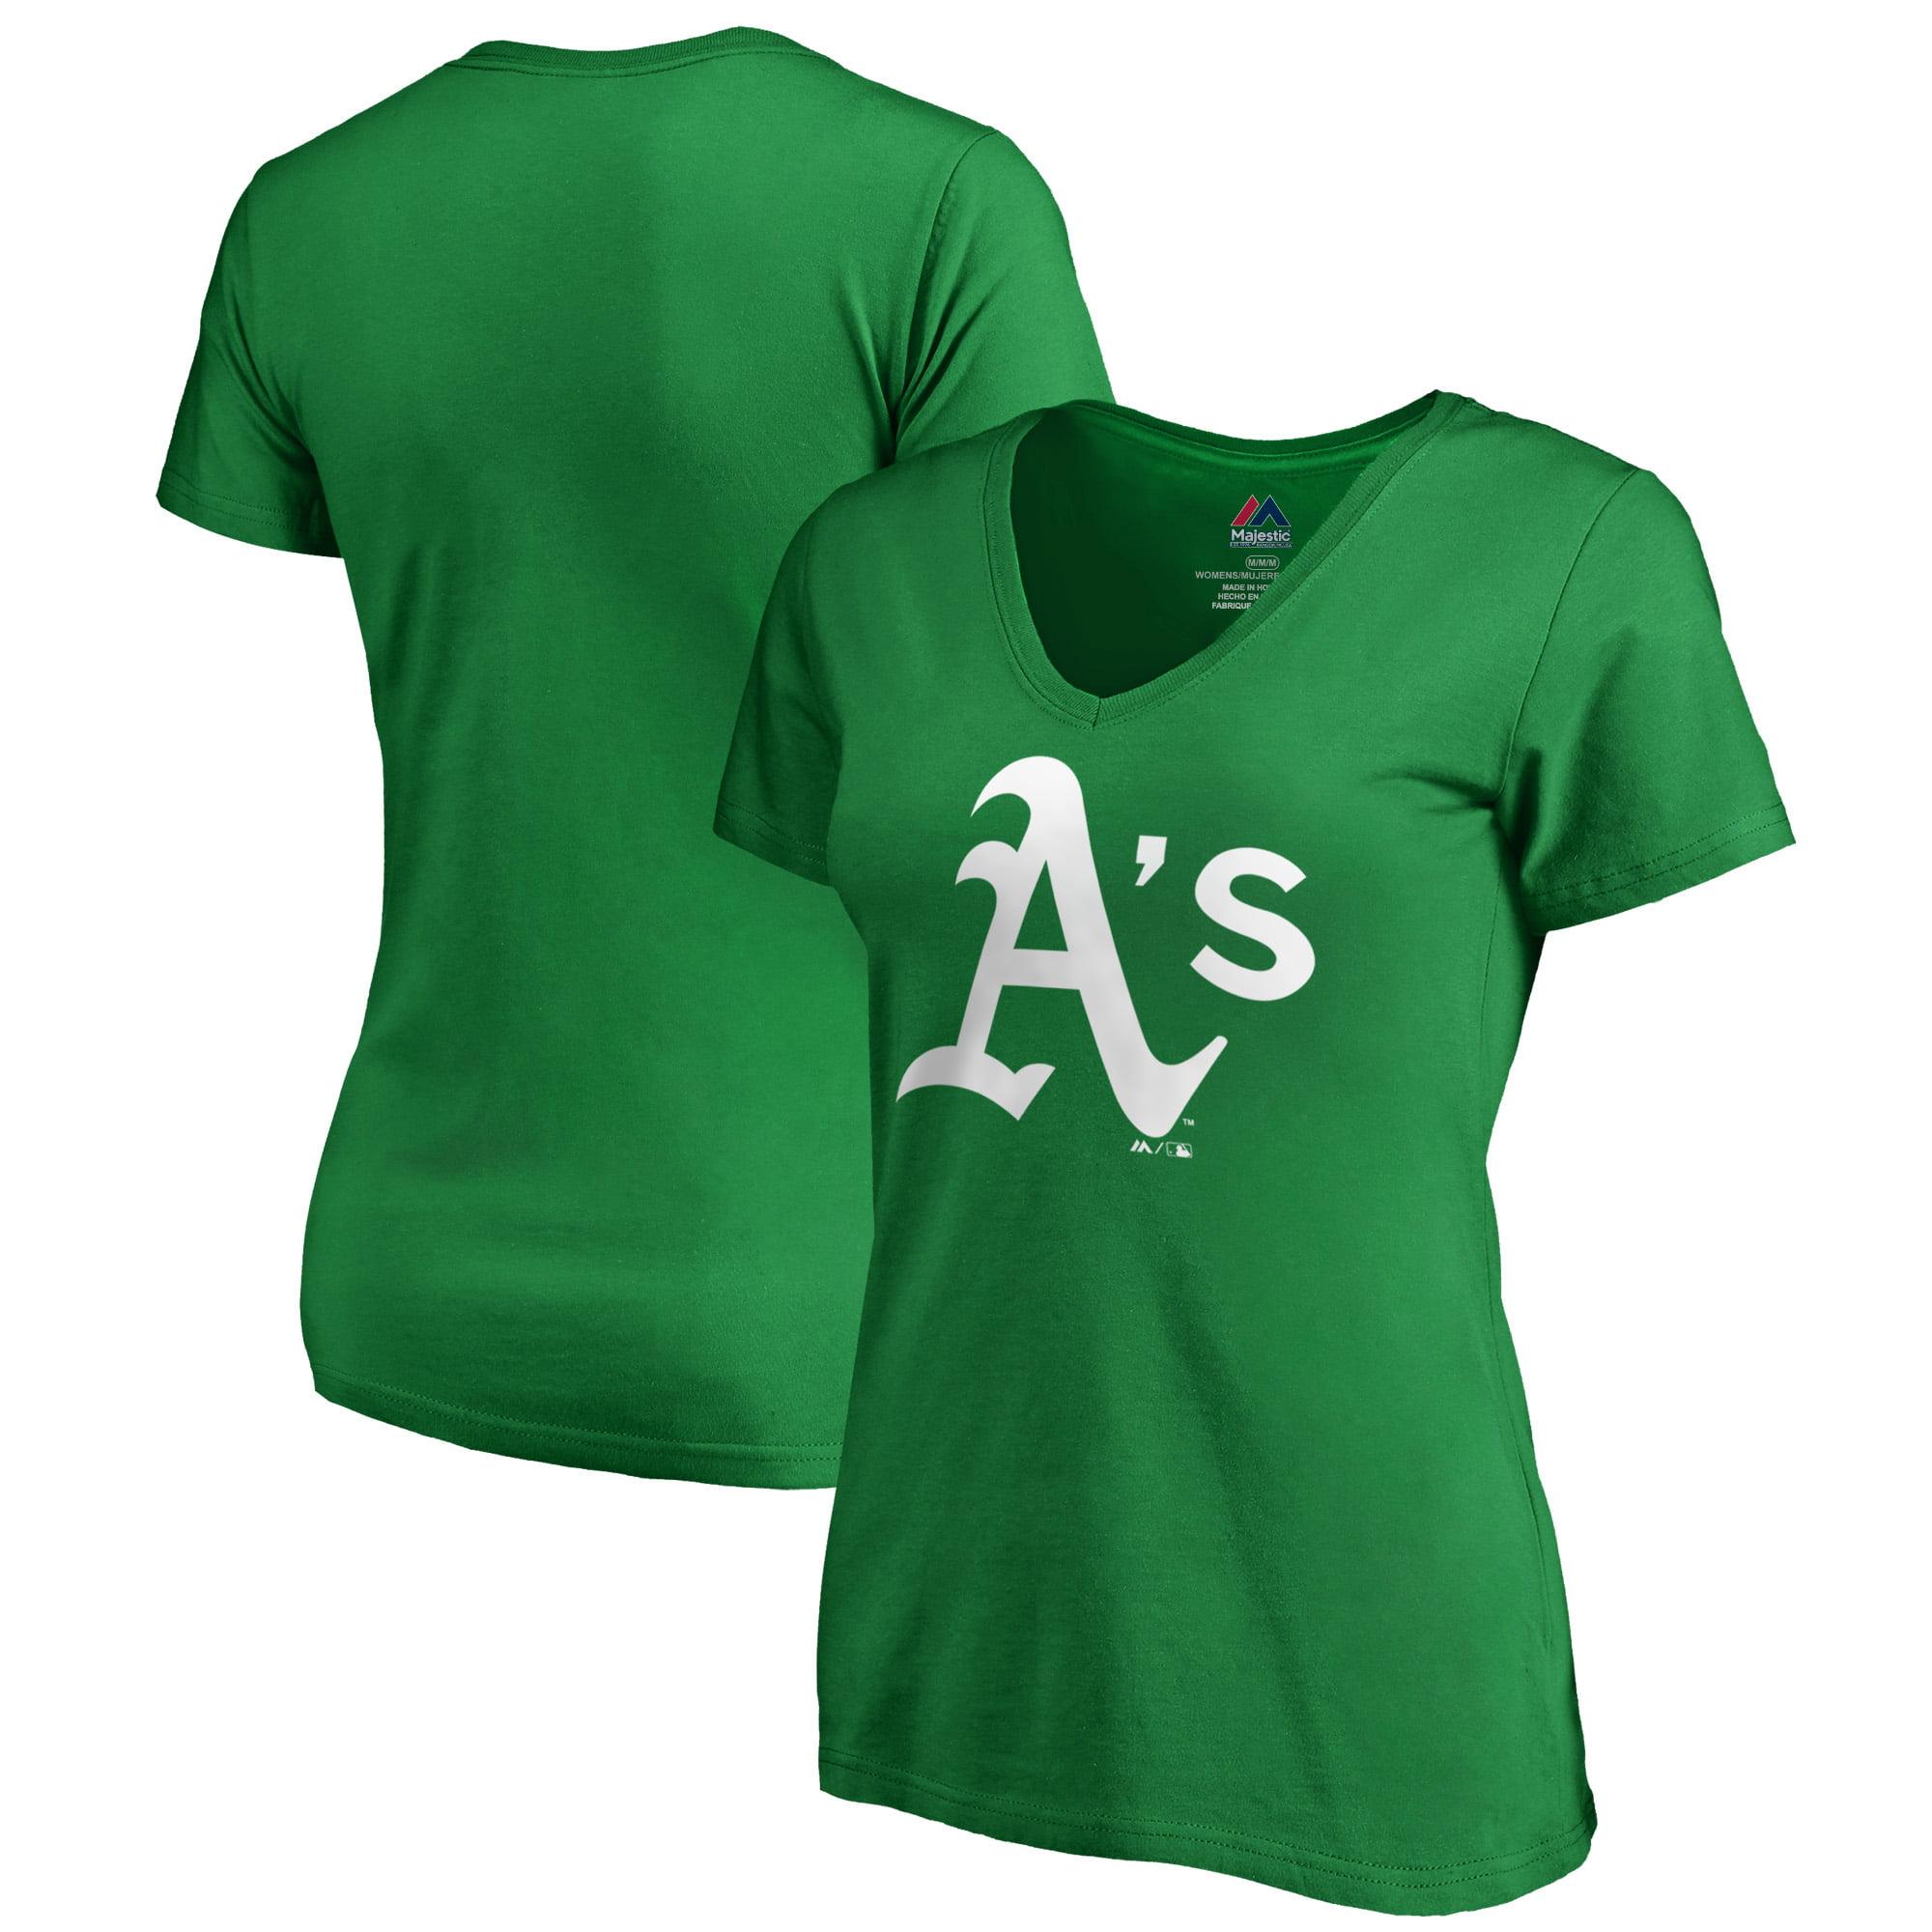 Oakland Athletics Majestic Women's St. Patrick's Day White Logo V-Neck T-Shirt - Kelly Green